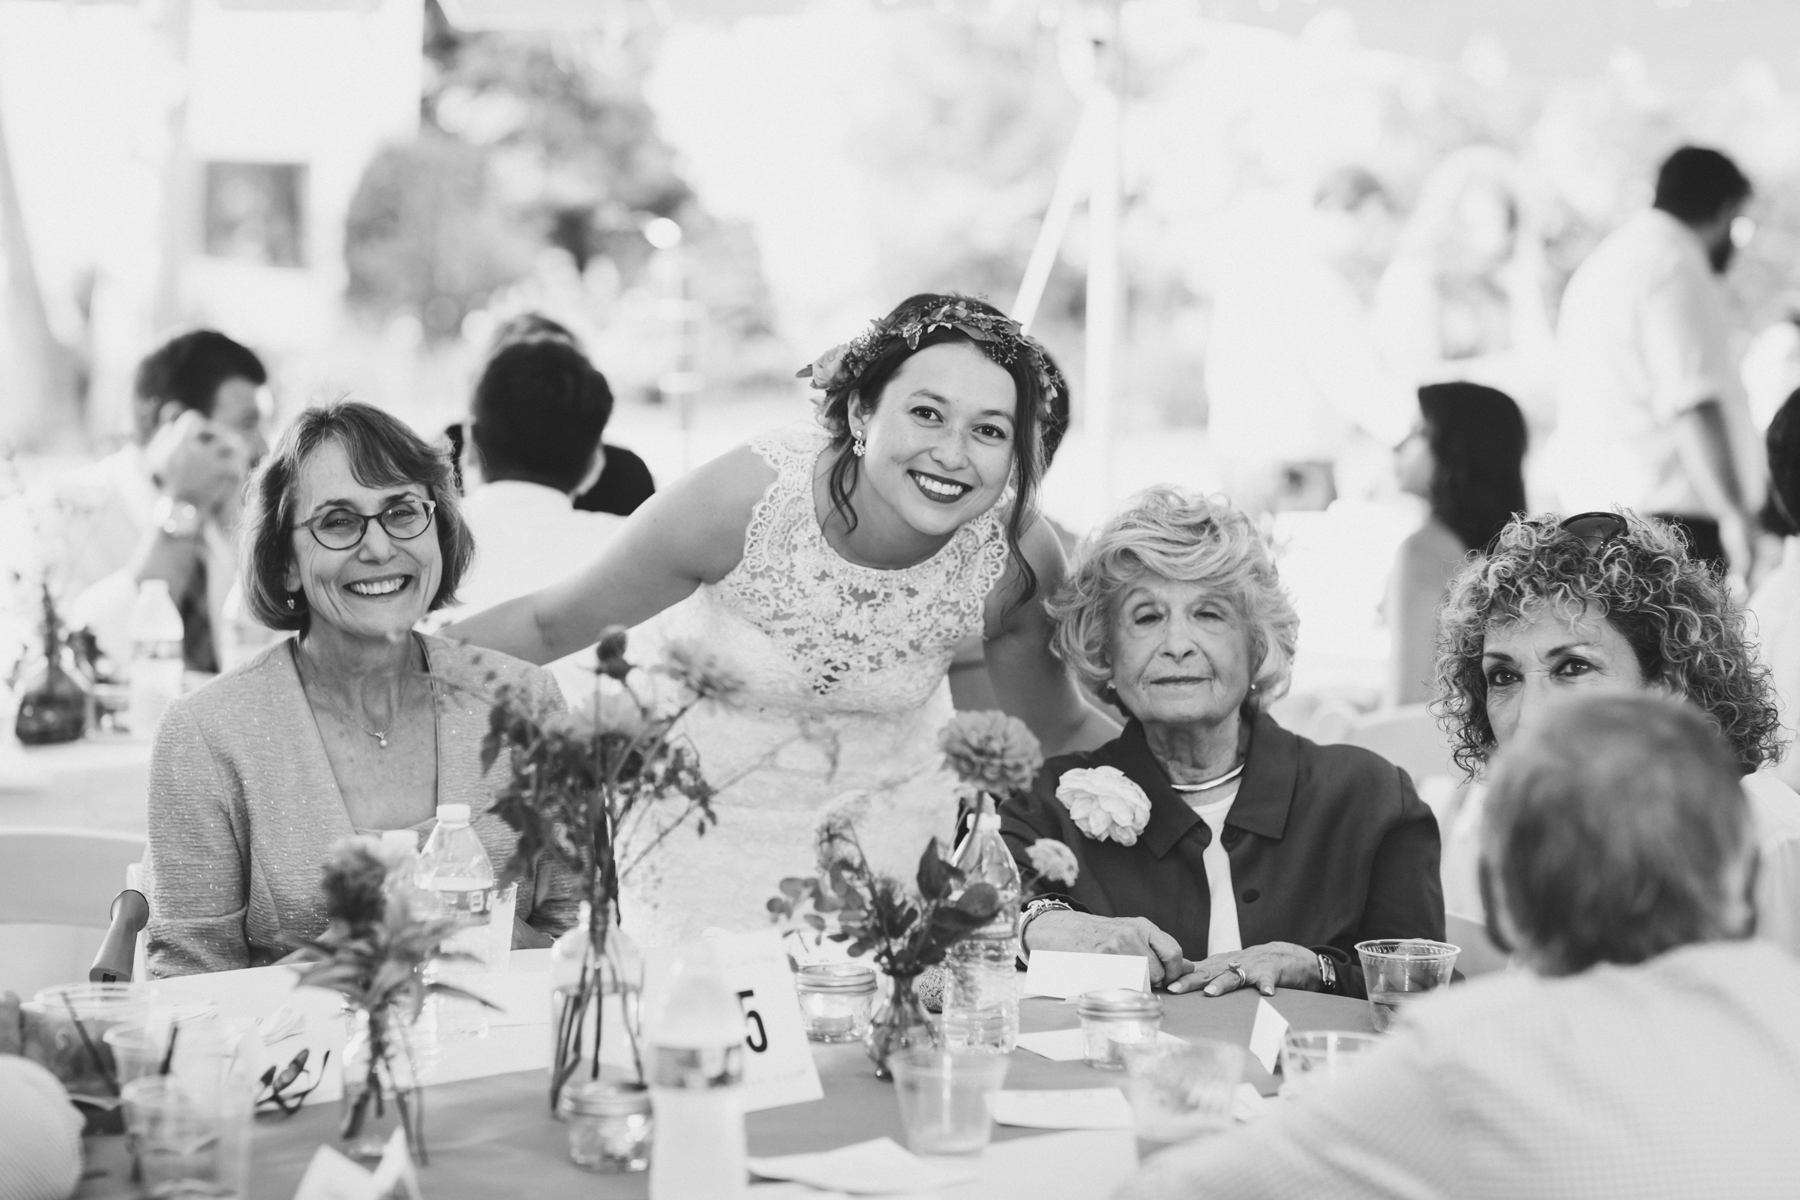 Long-Island-Documentary-Wedding-Photography-Summer-Tent-Wedding-in-New-York-108.jpg